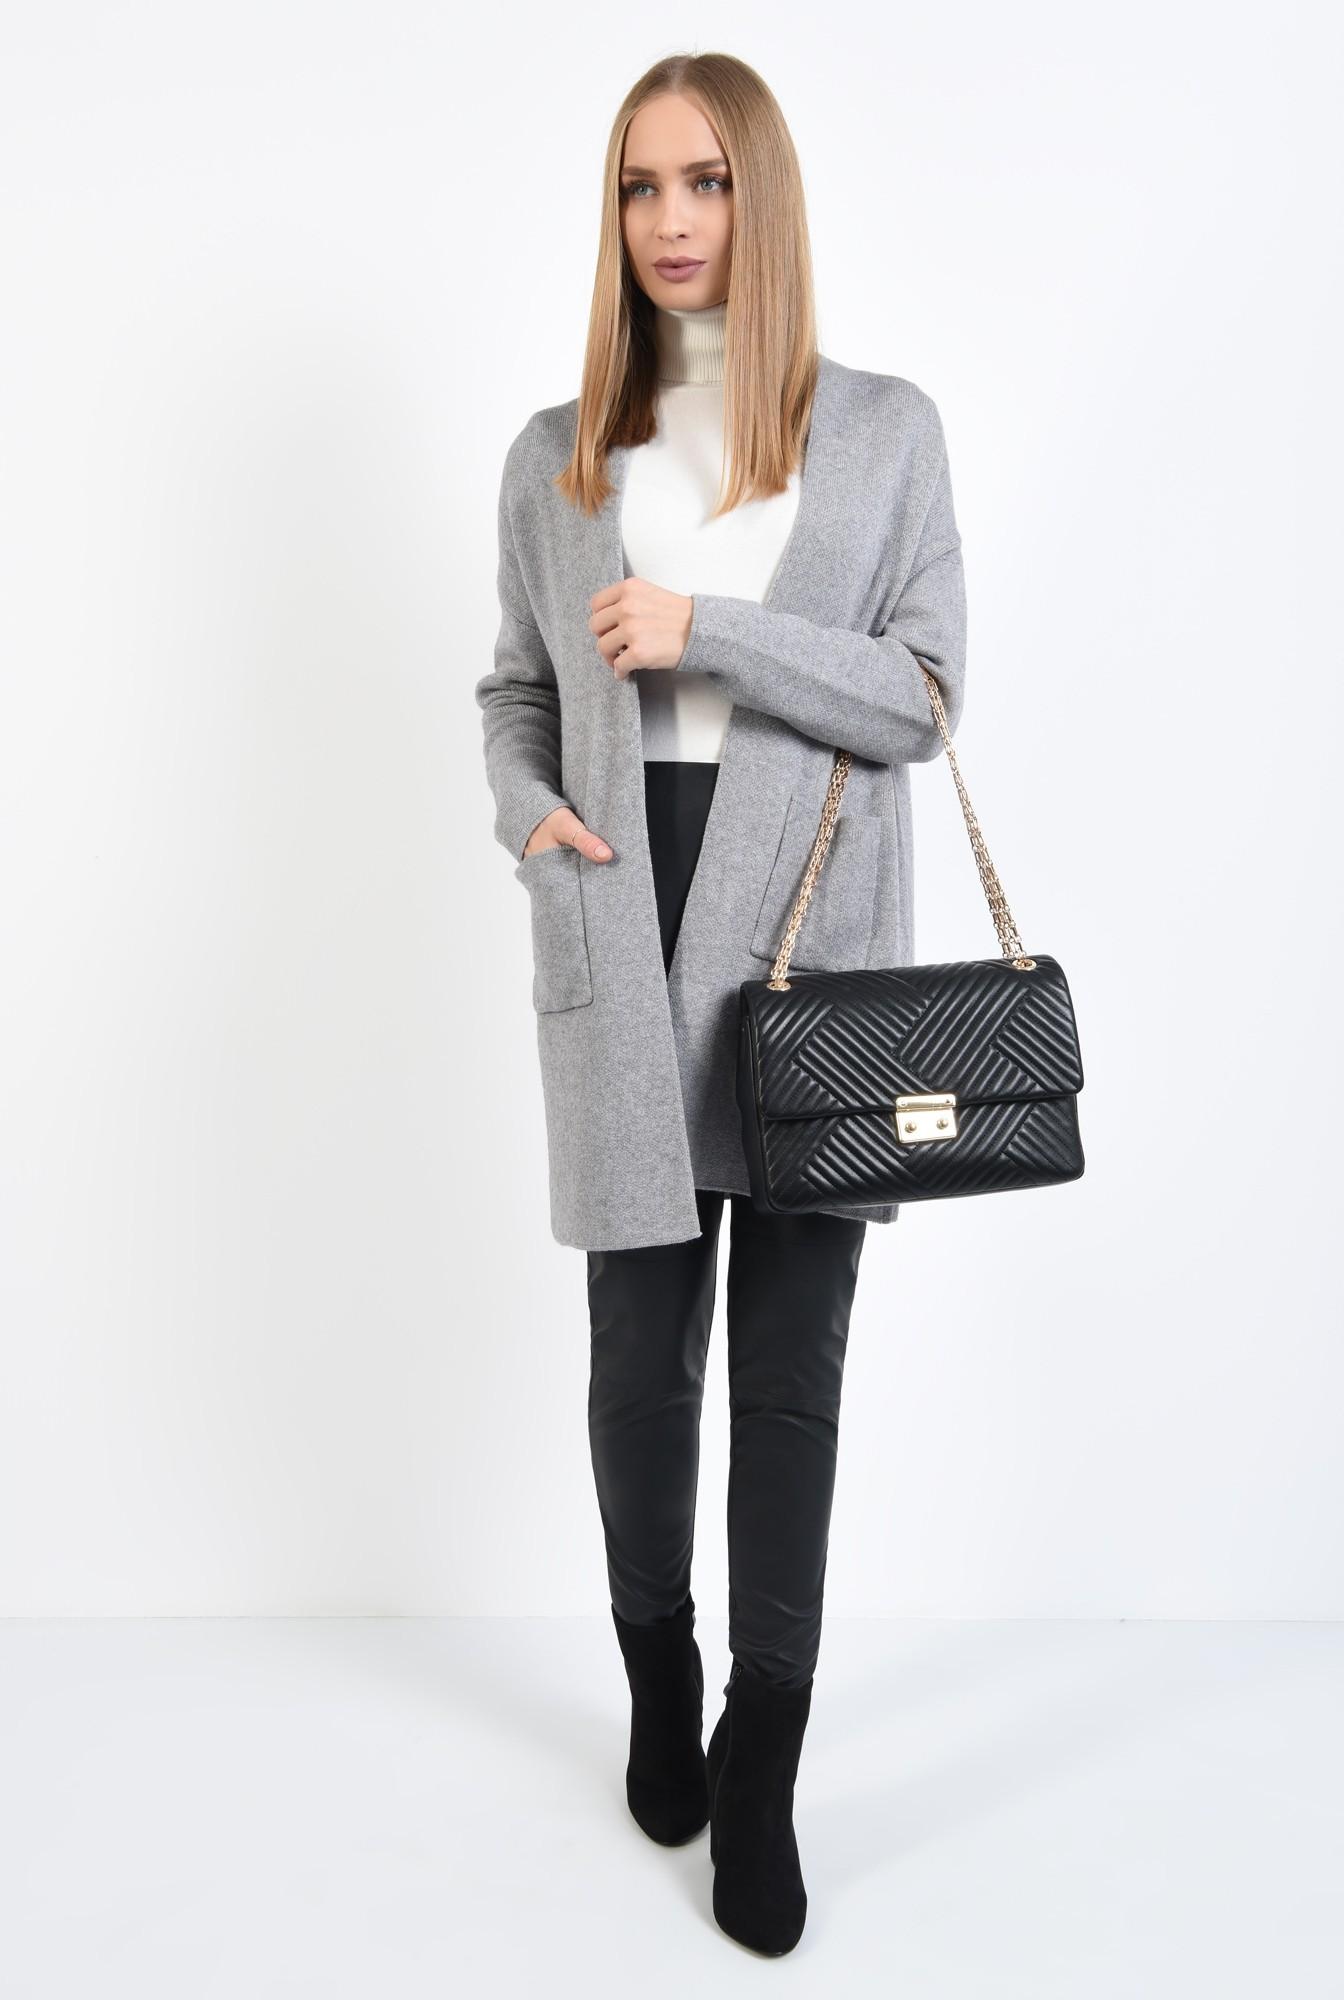 3 - pulover gri, jacheta de toamna, croi drept lejer